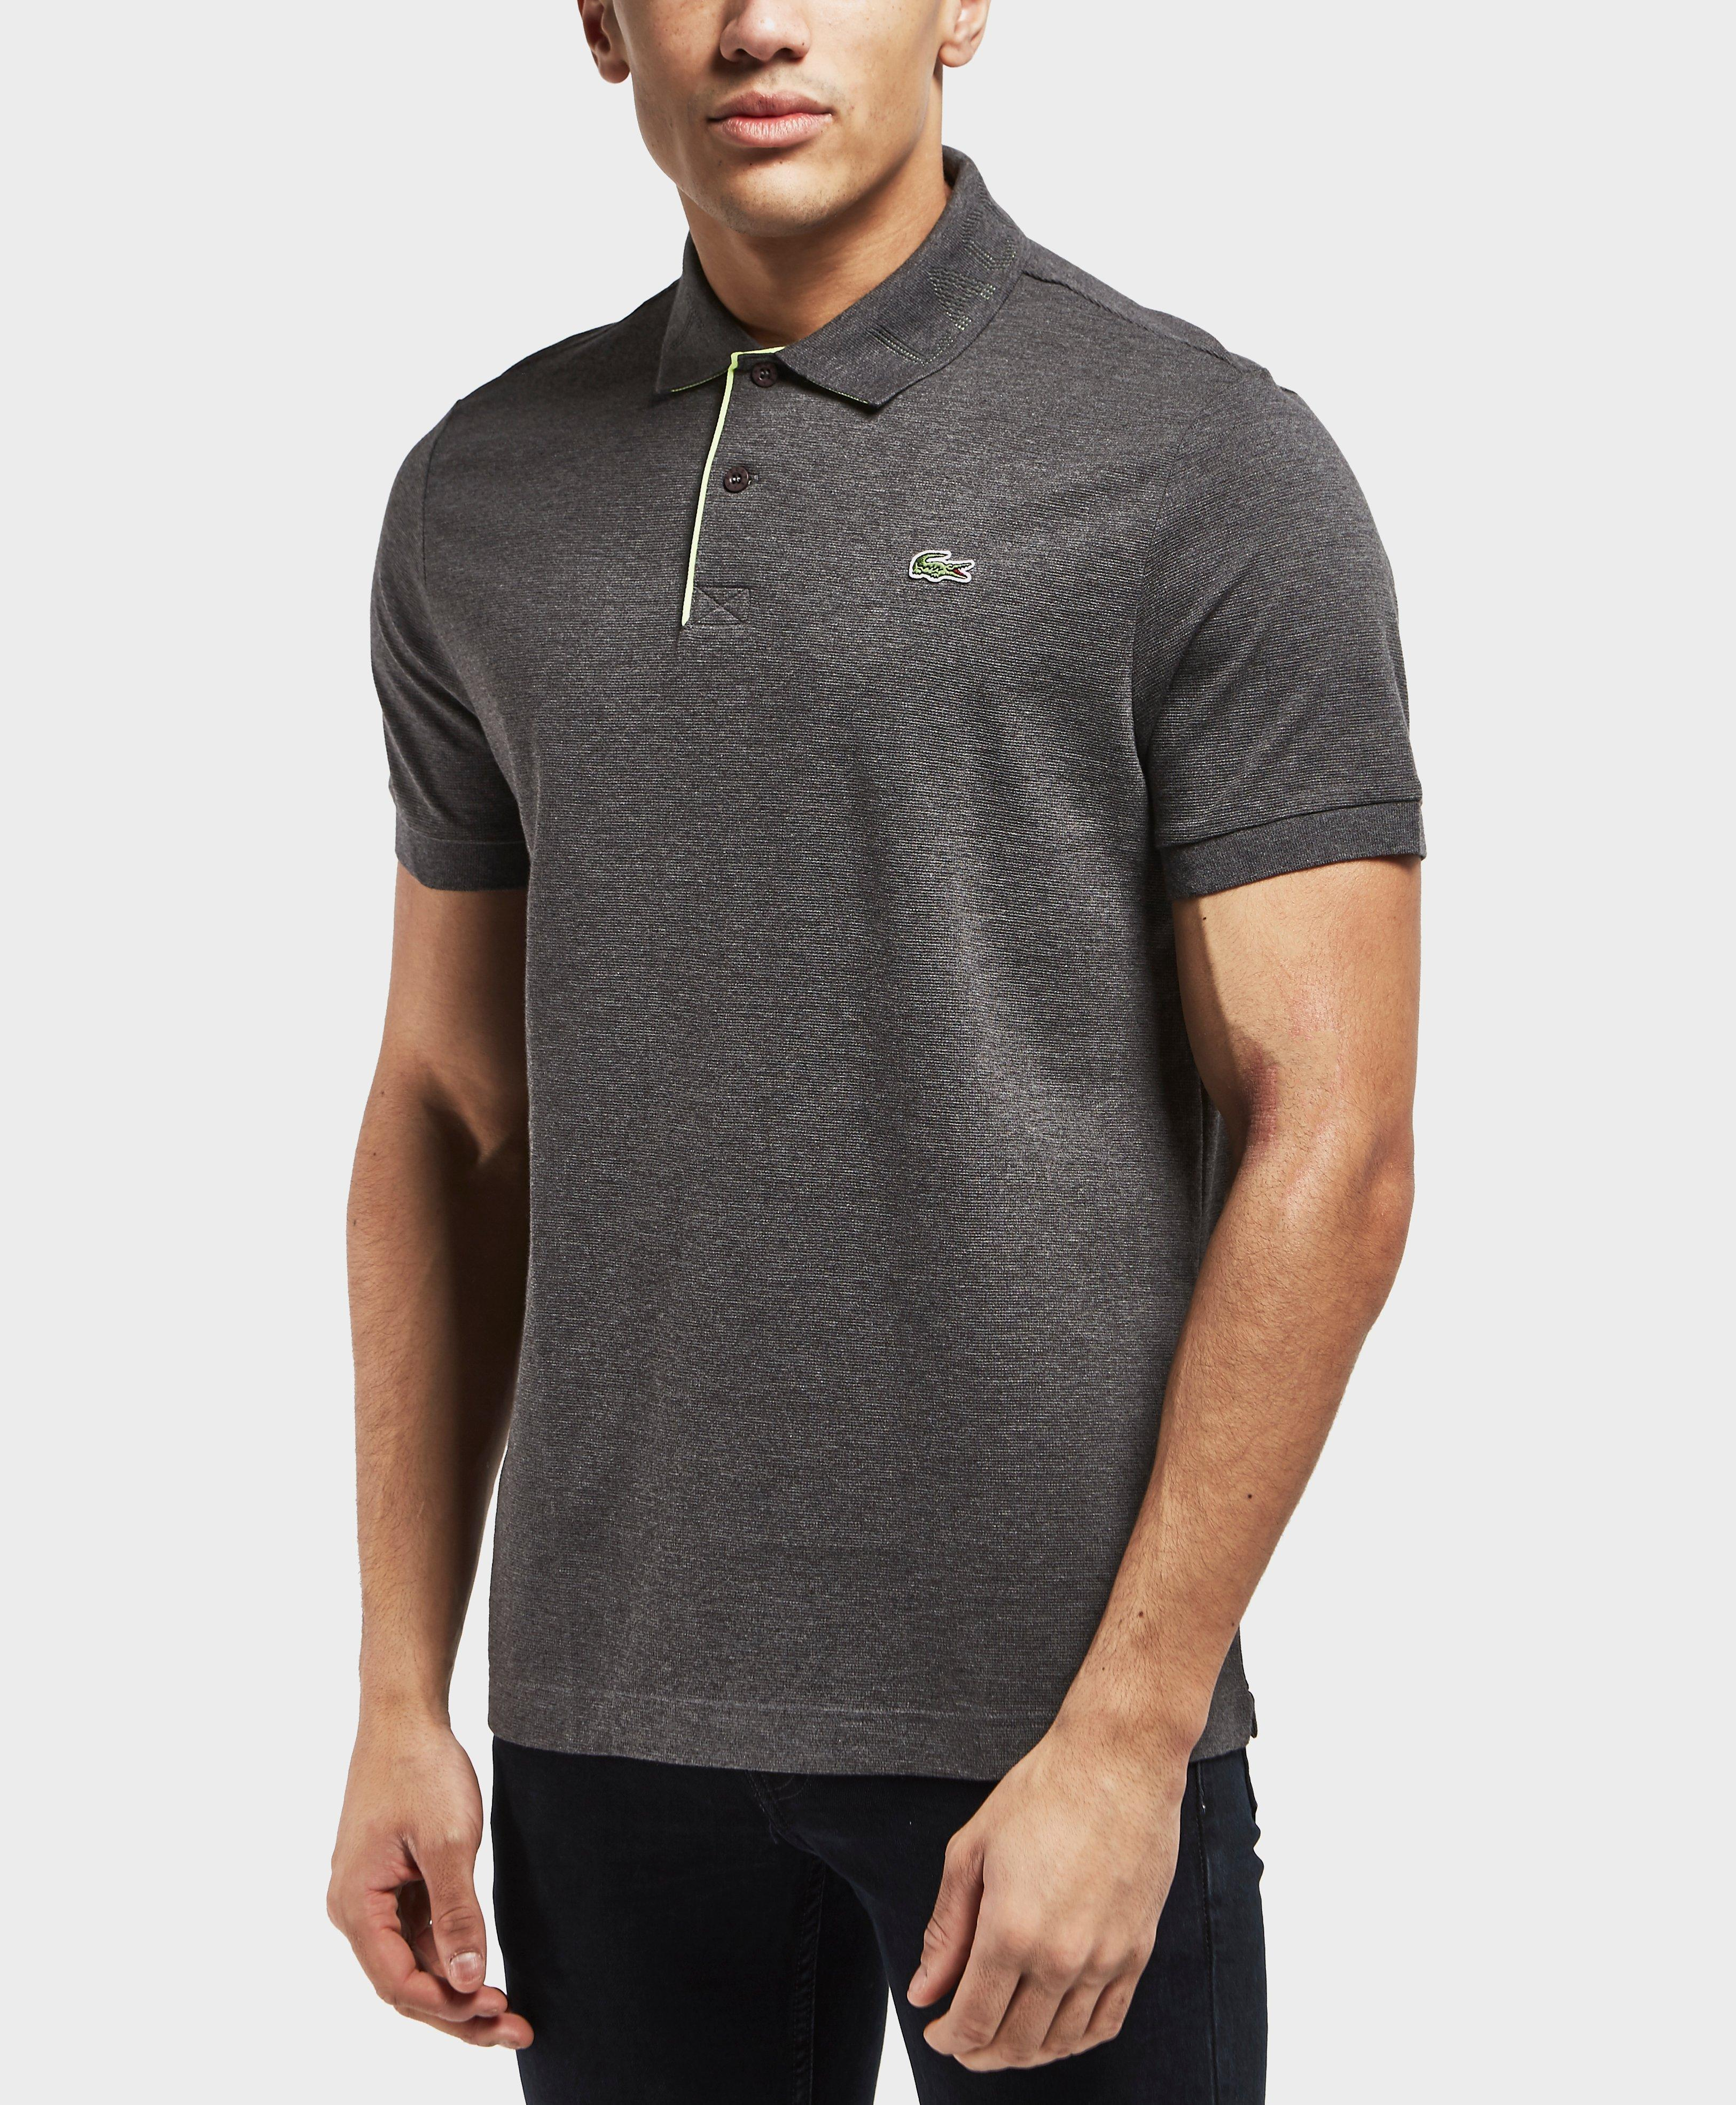 Lyst lacoste logo collar short sleeve polo shirt in gray for Short sleeve lacoste shirt